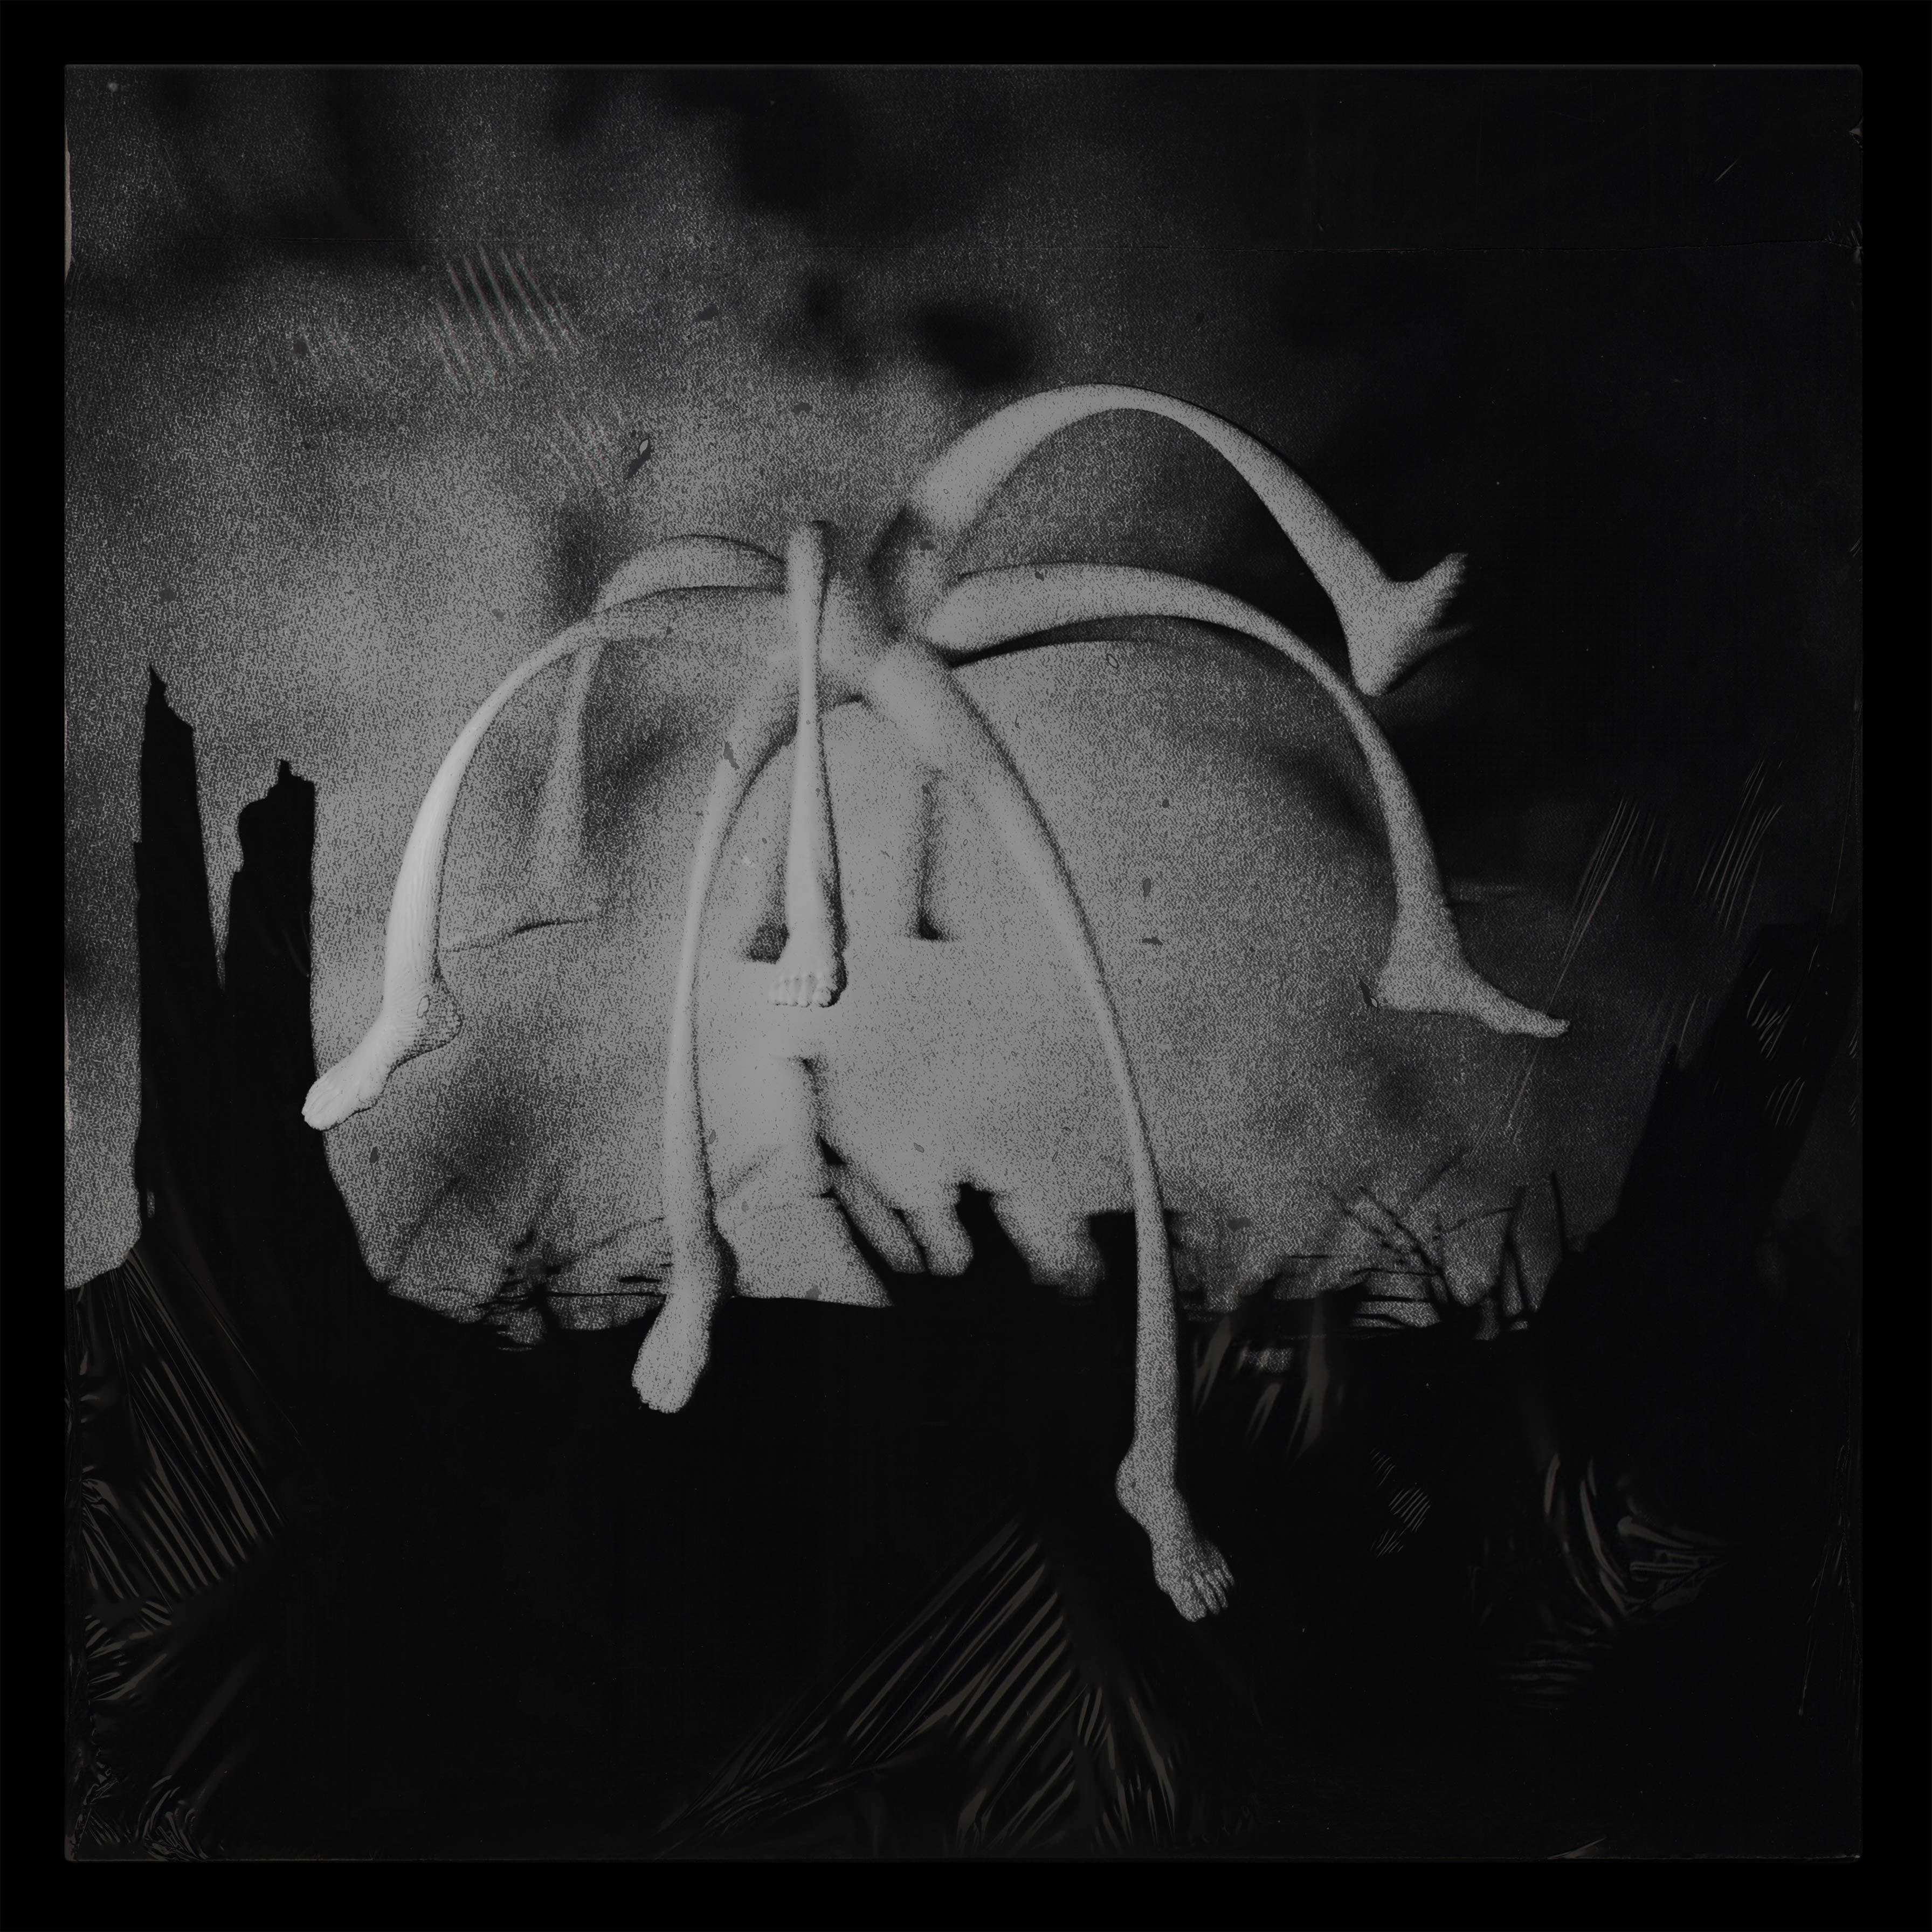 House of Reptile - Album Cover